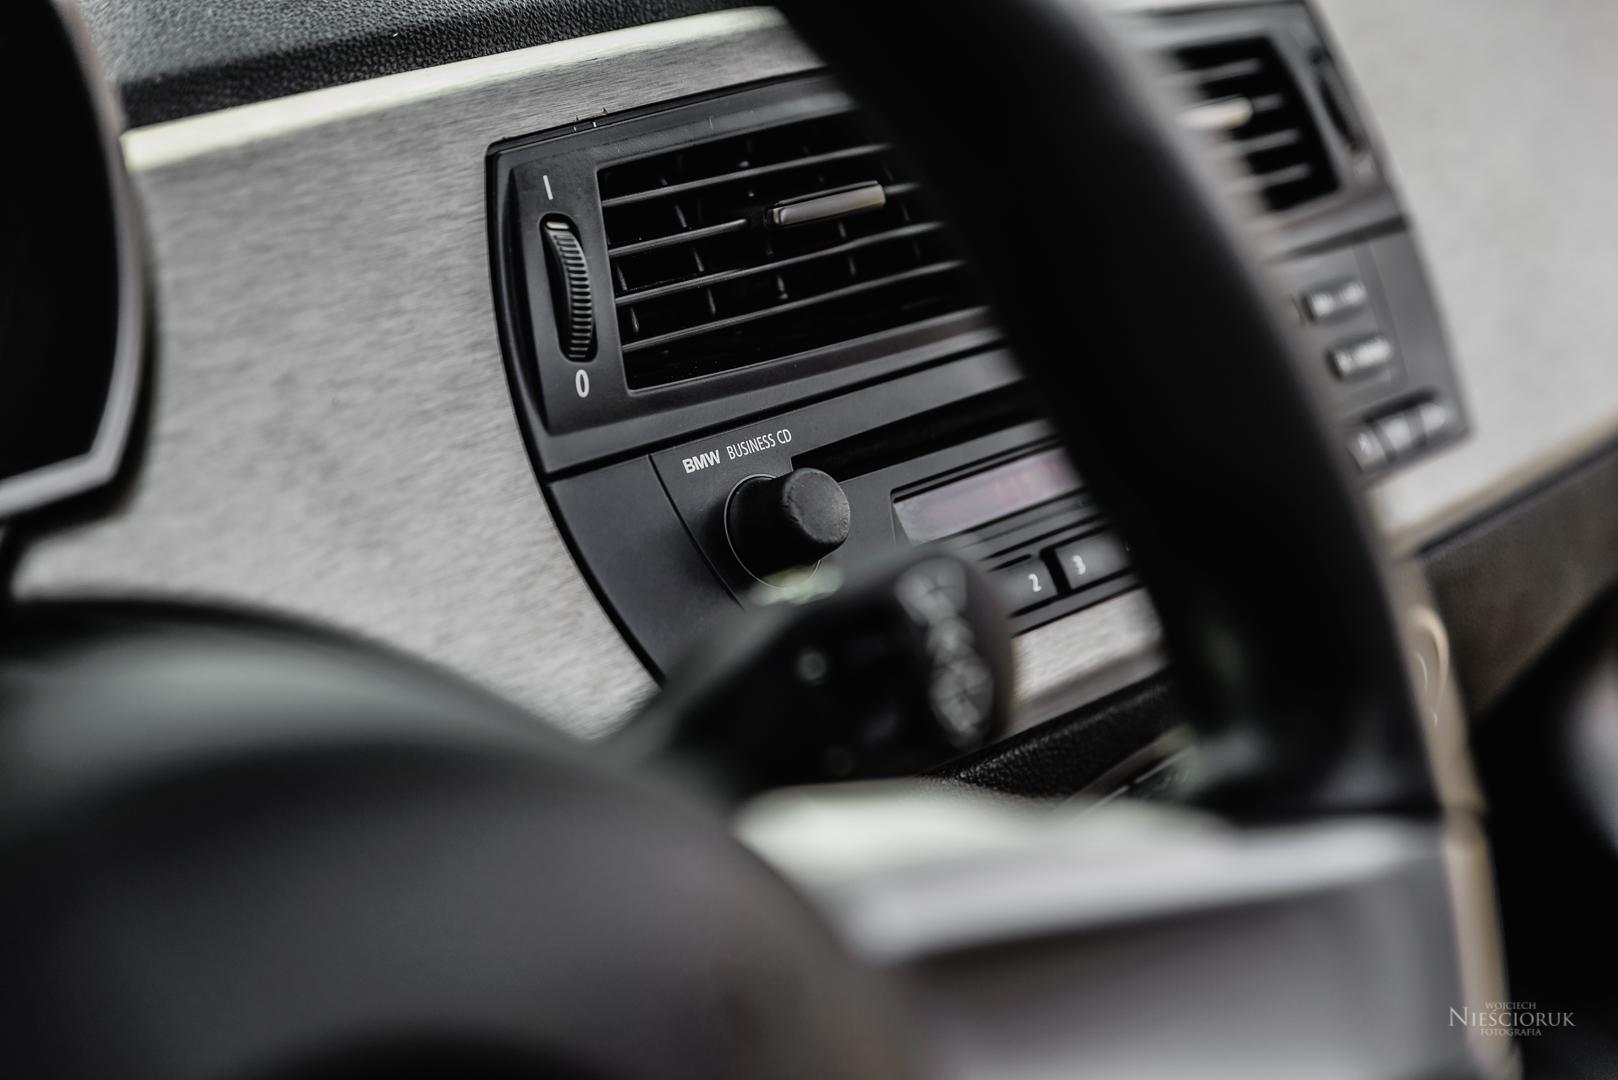 Olx kupno samochodu